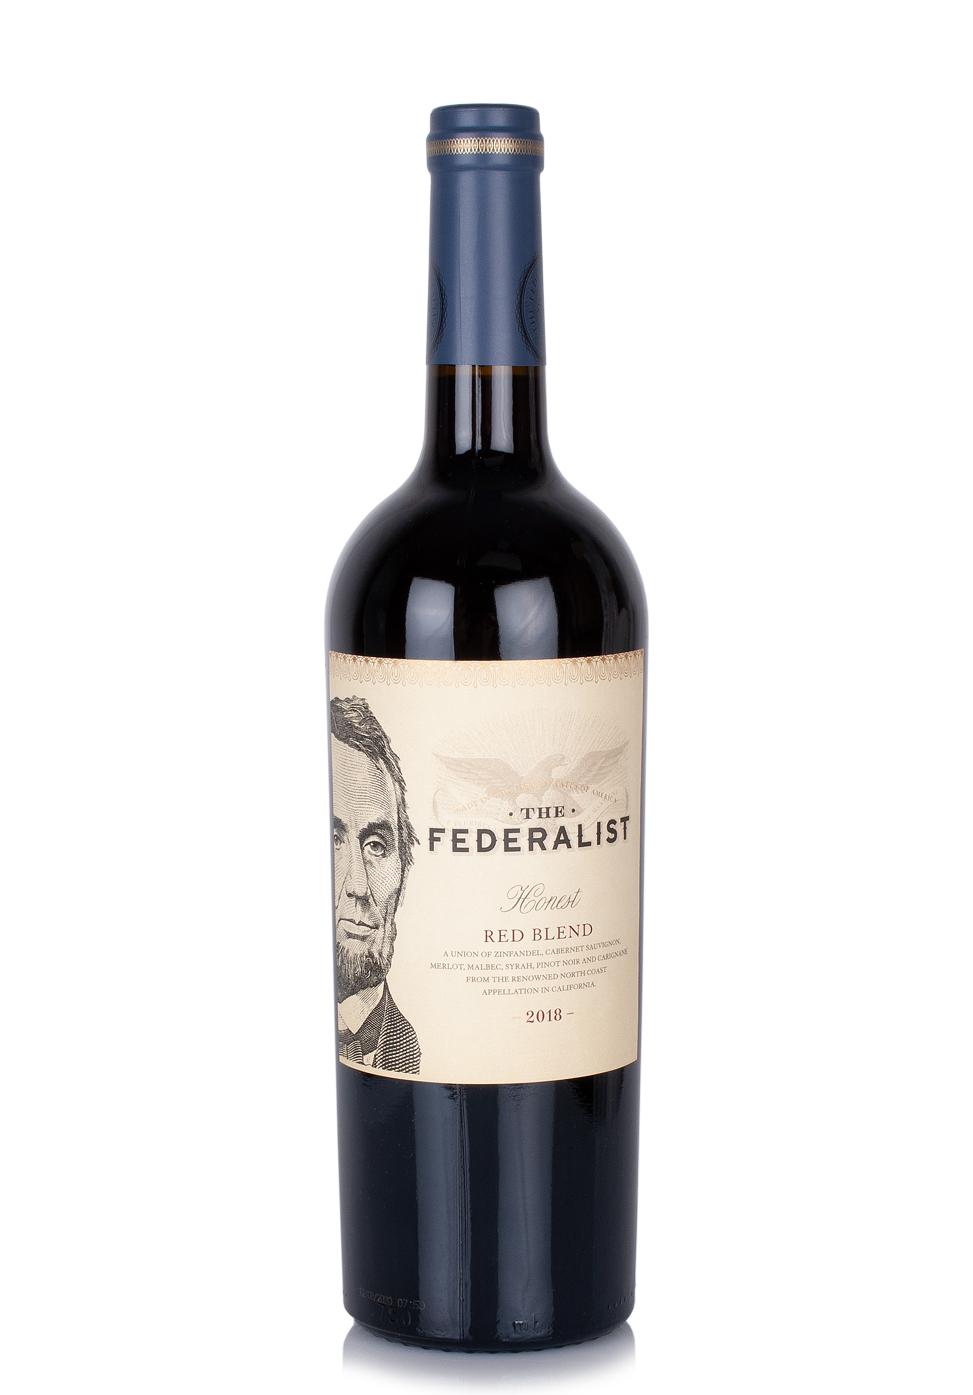 Vin The Federalist, Honest Red Blend 2018 (0.75L)